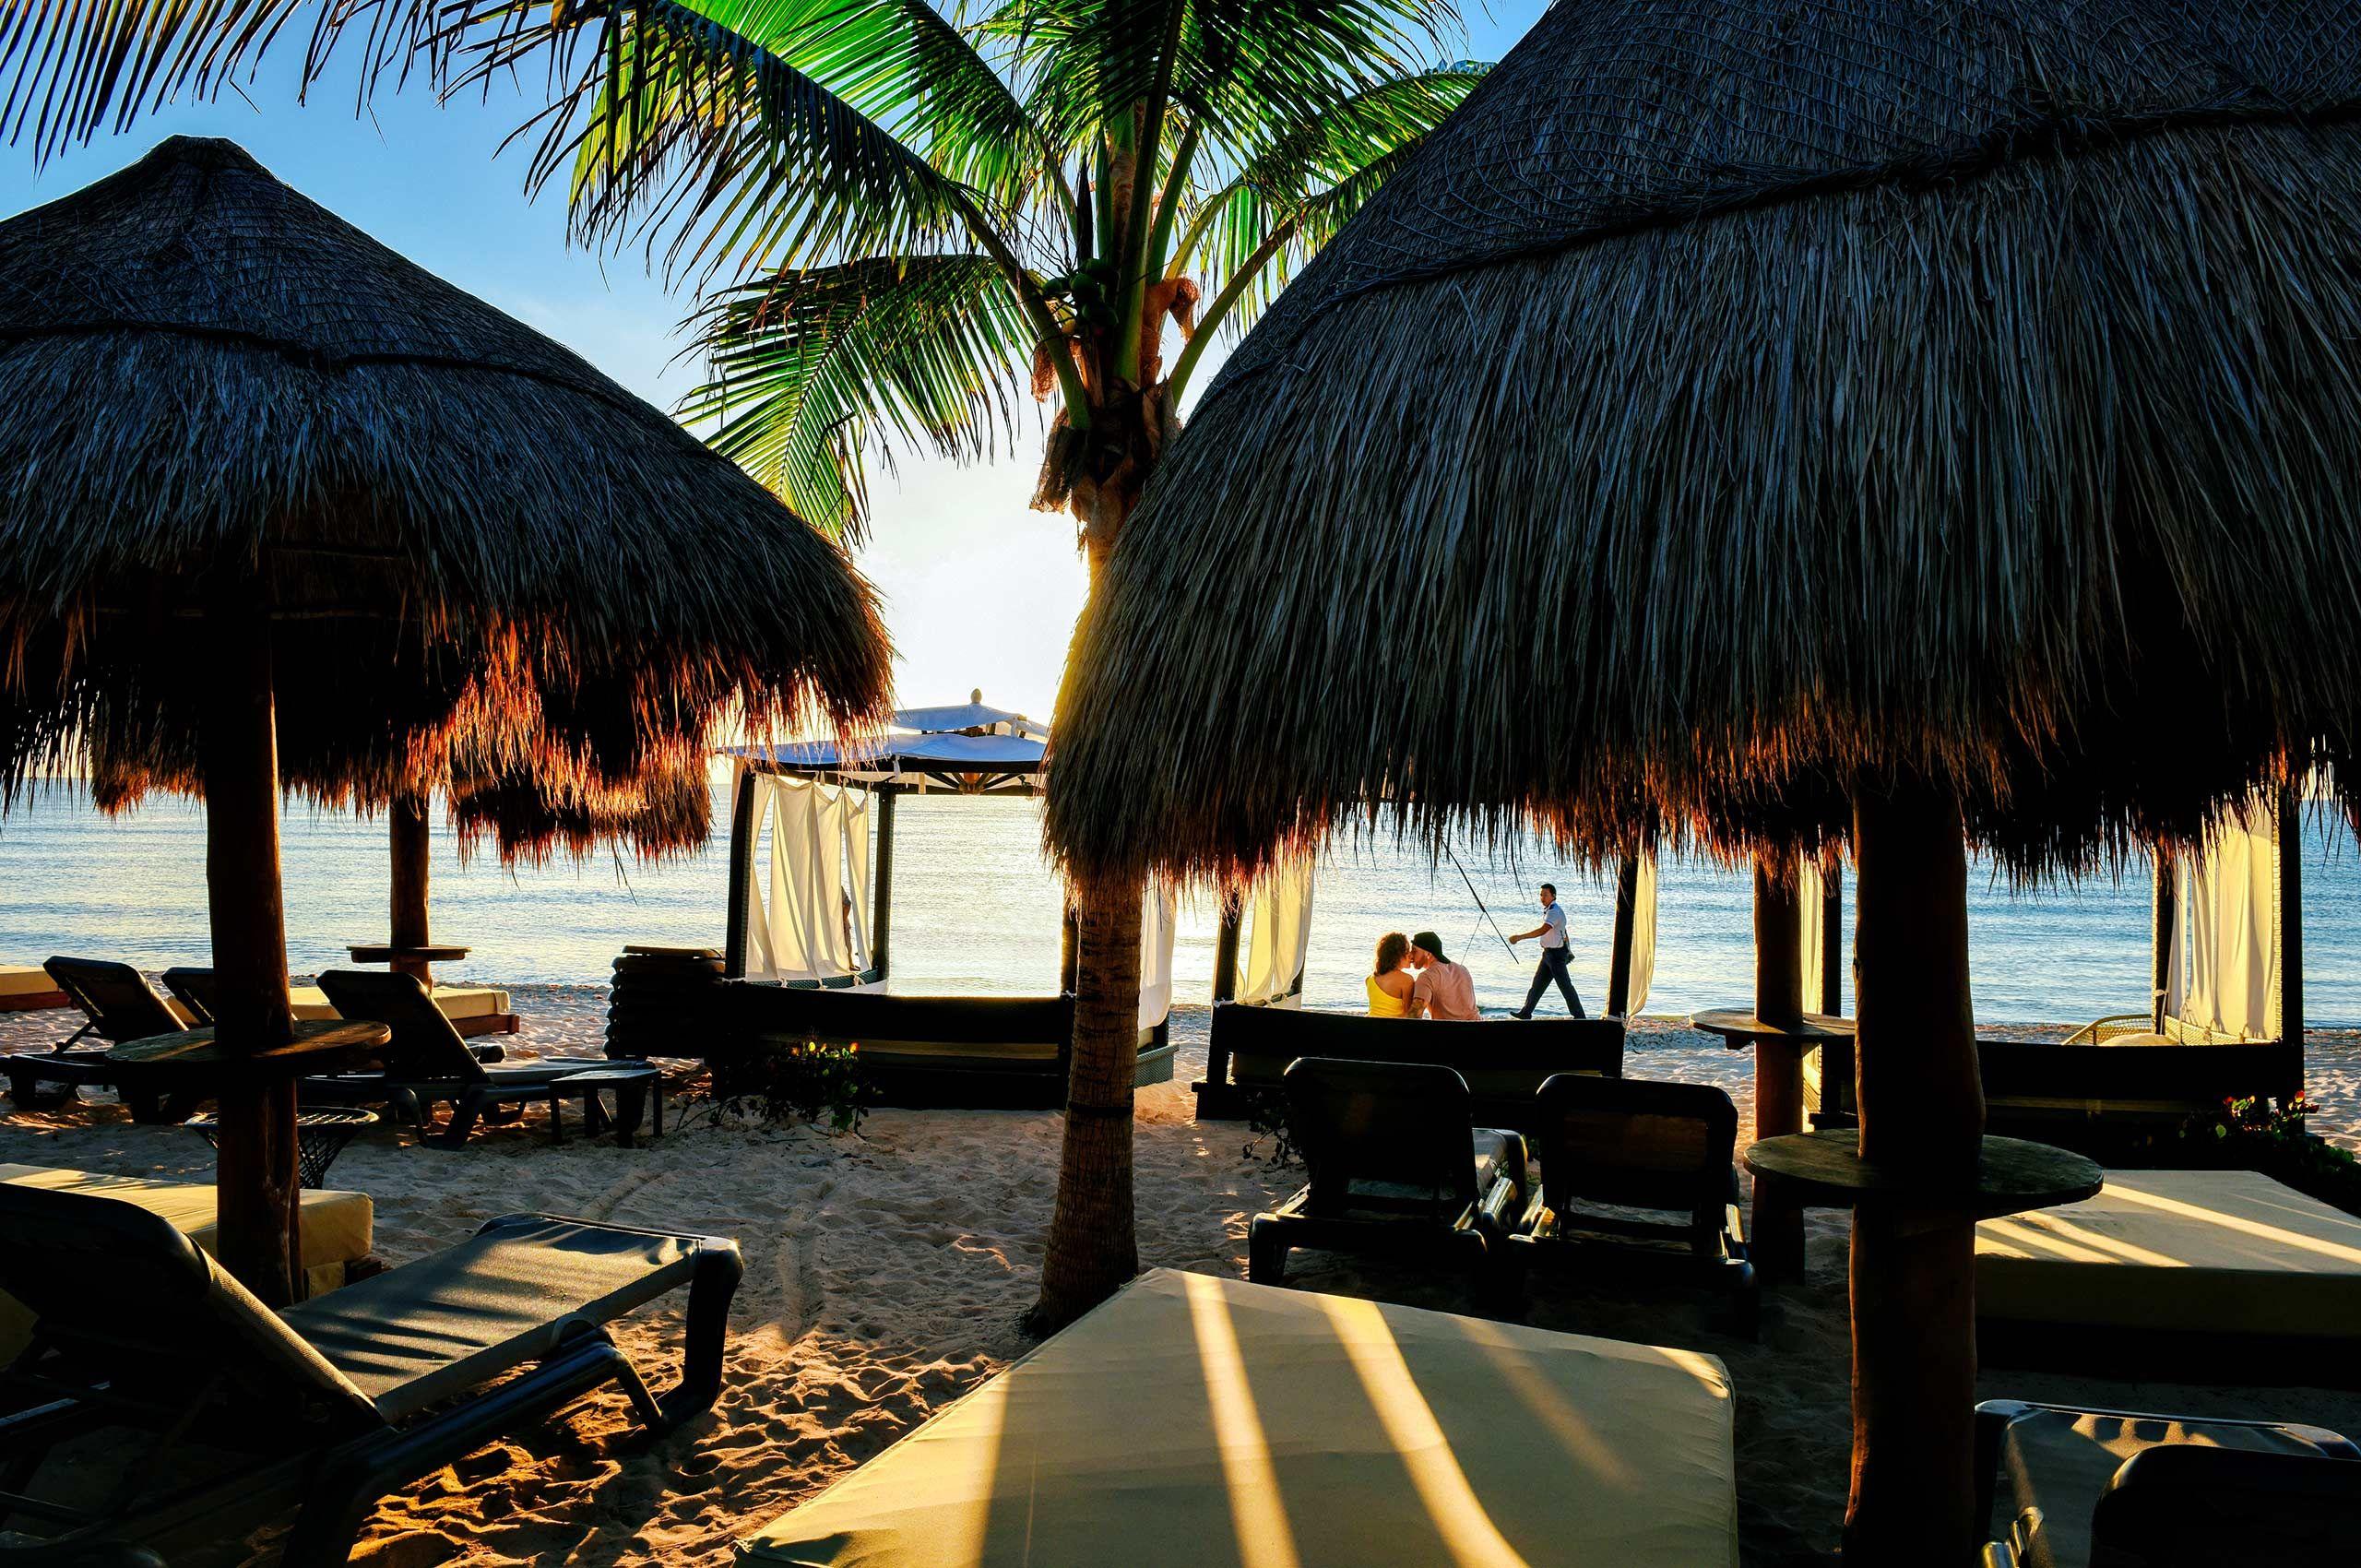 casual-photoshoot-playa-del-carmen-mexico